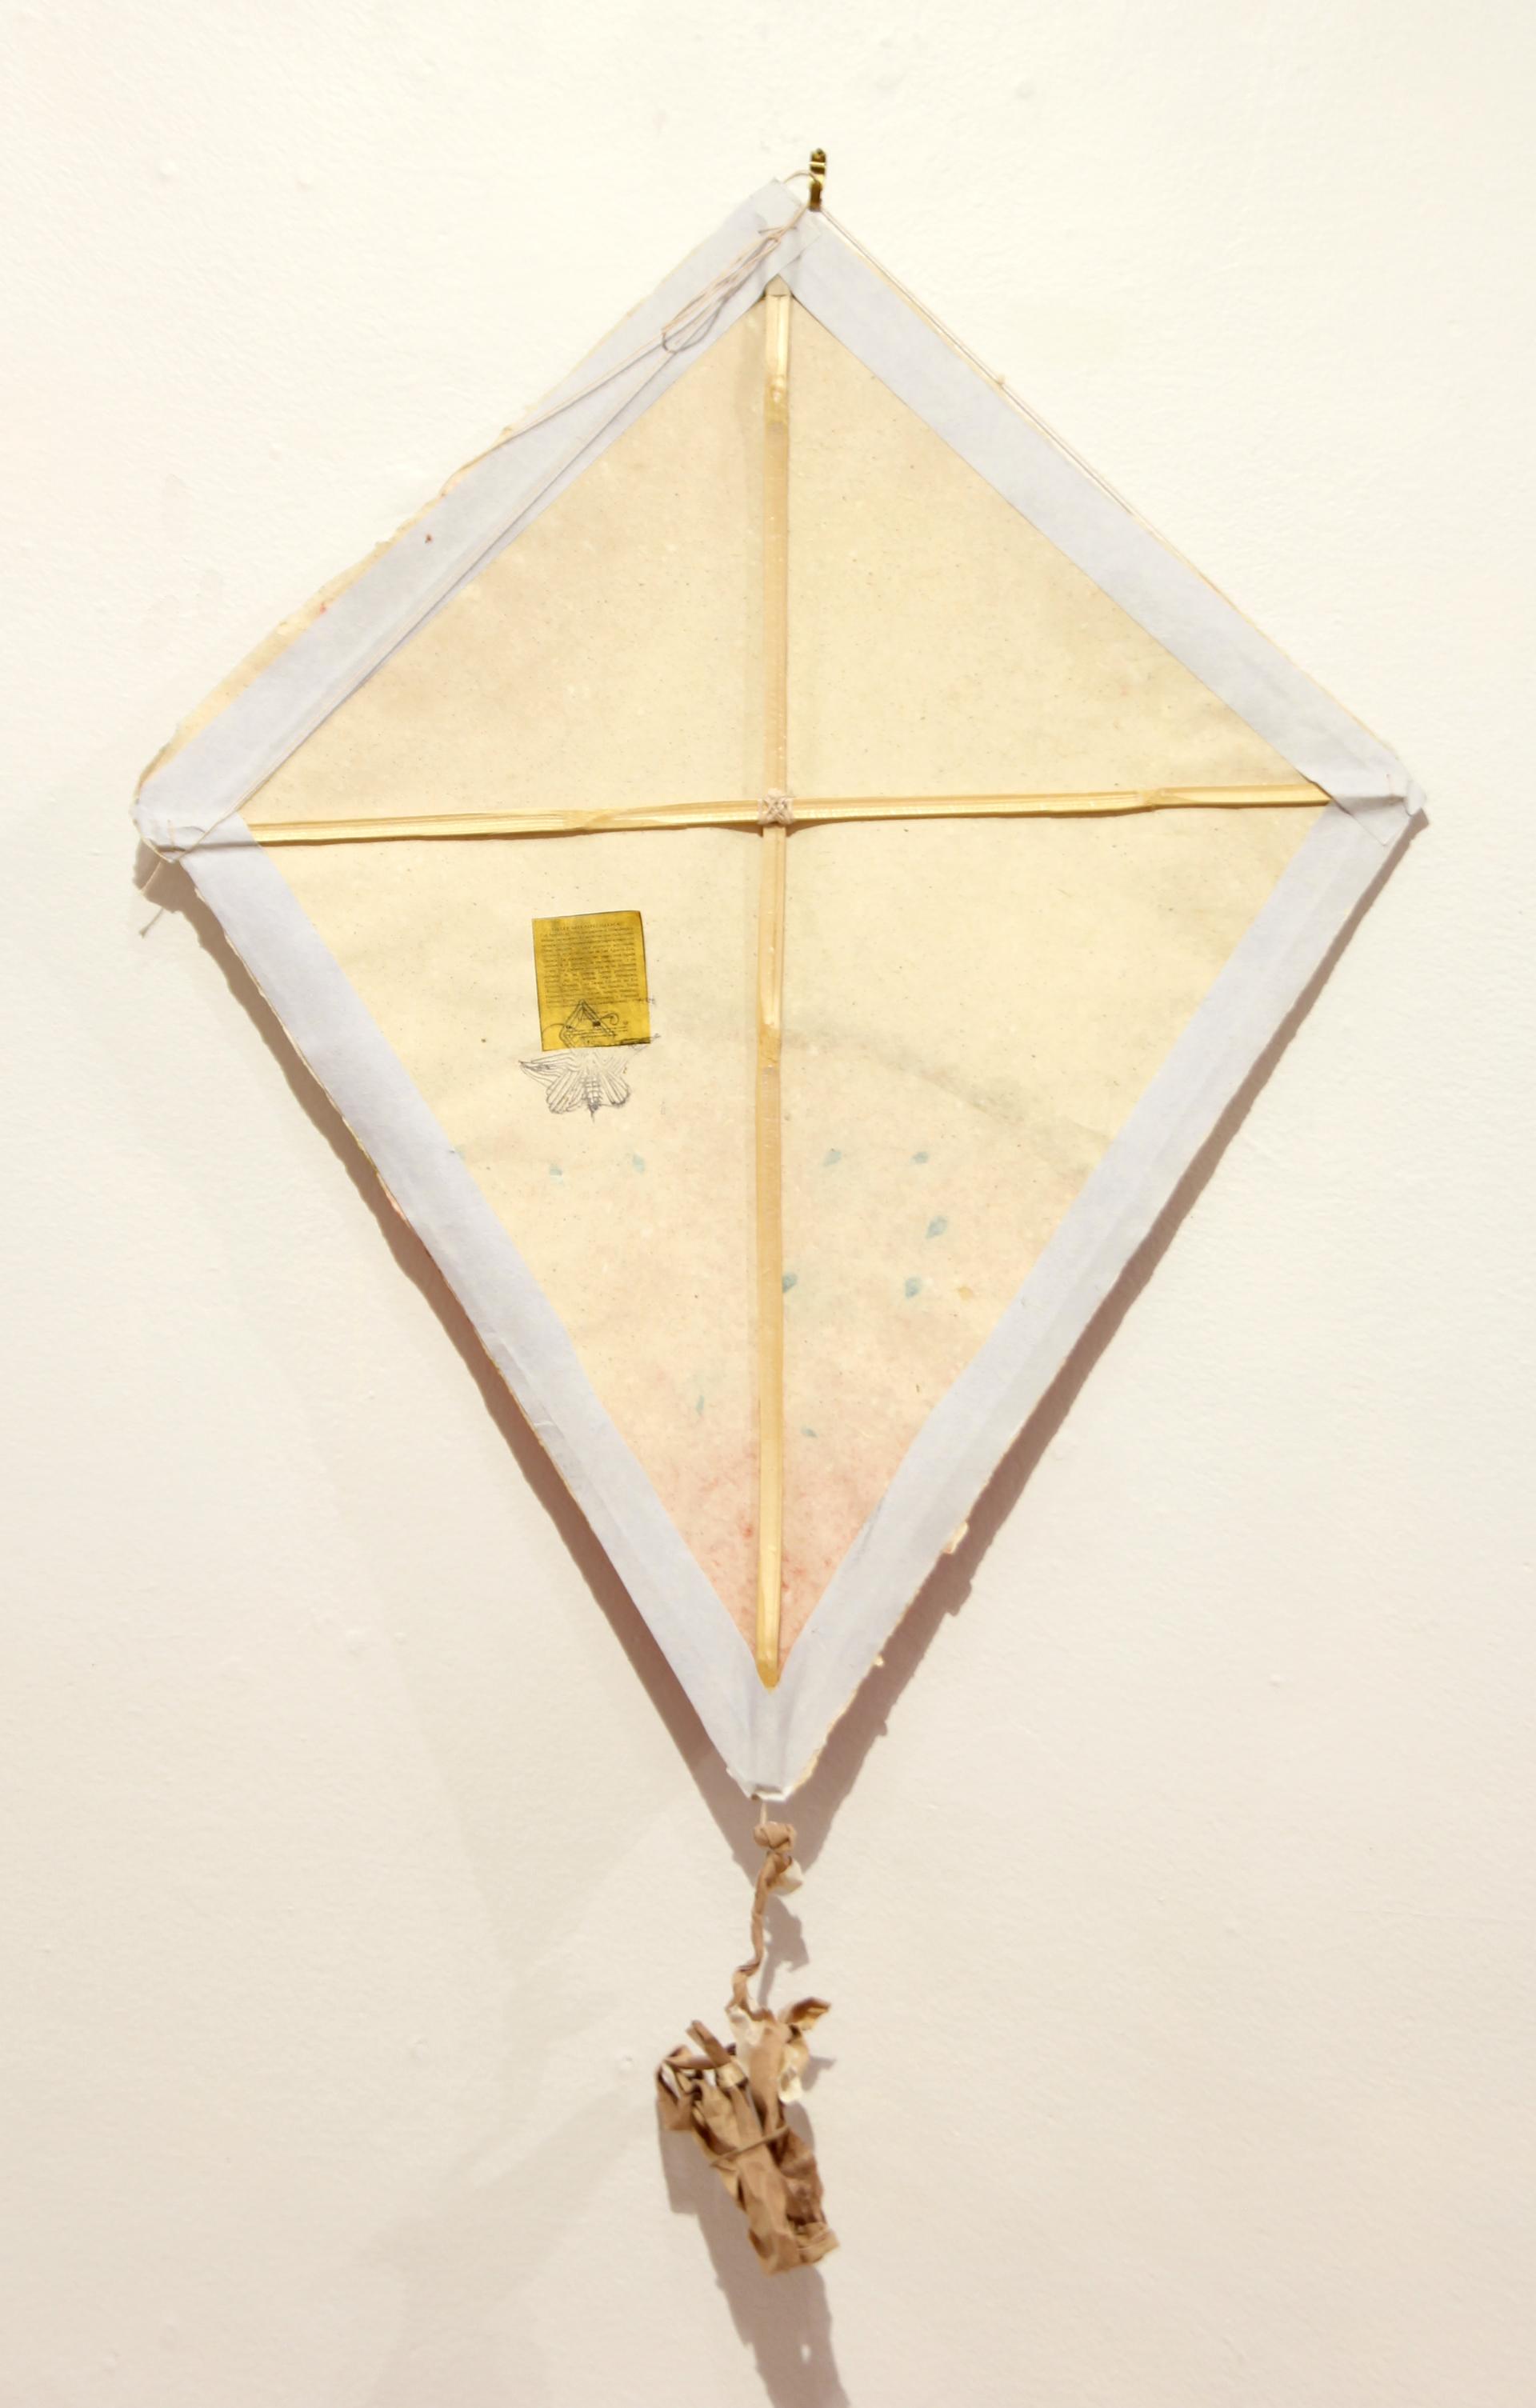 Sandia Kite by Francisco Toledo (1940 - 2019)